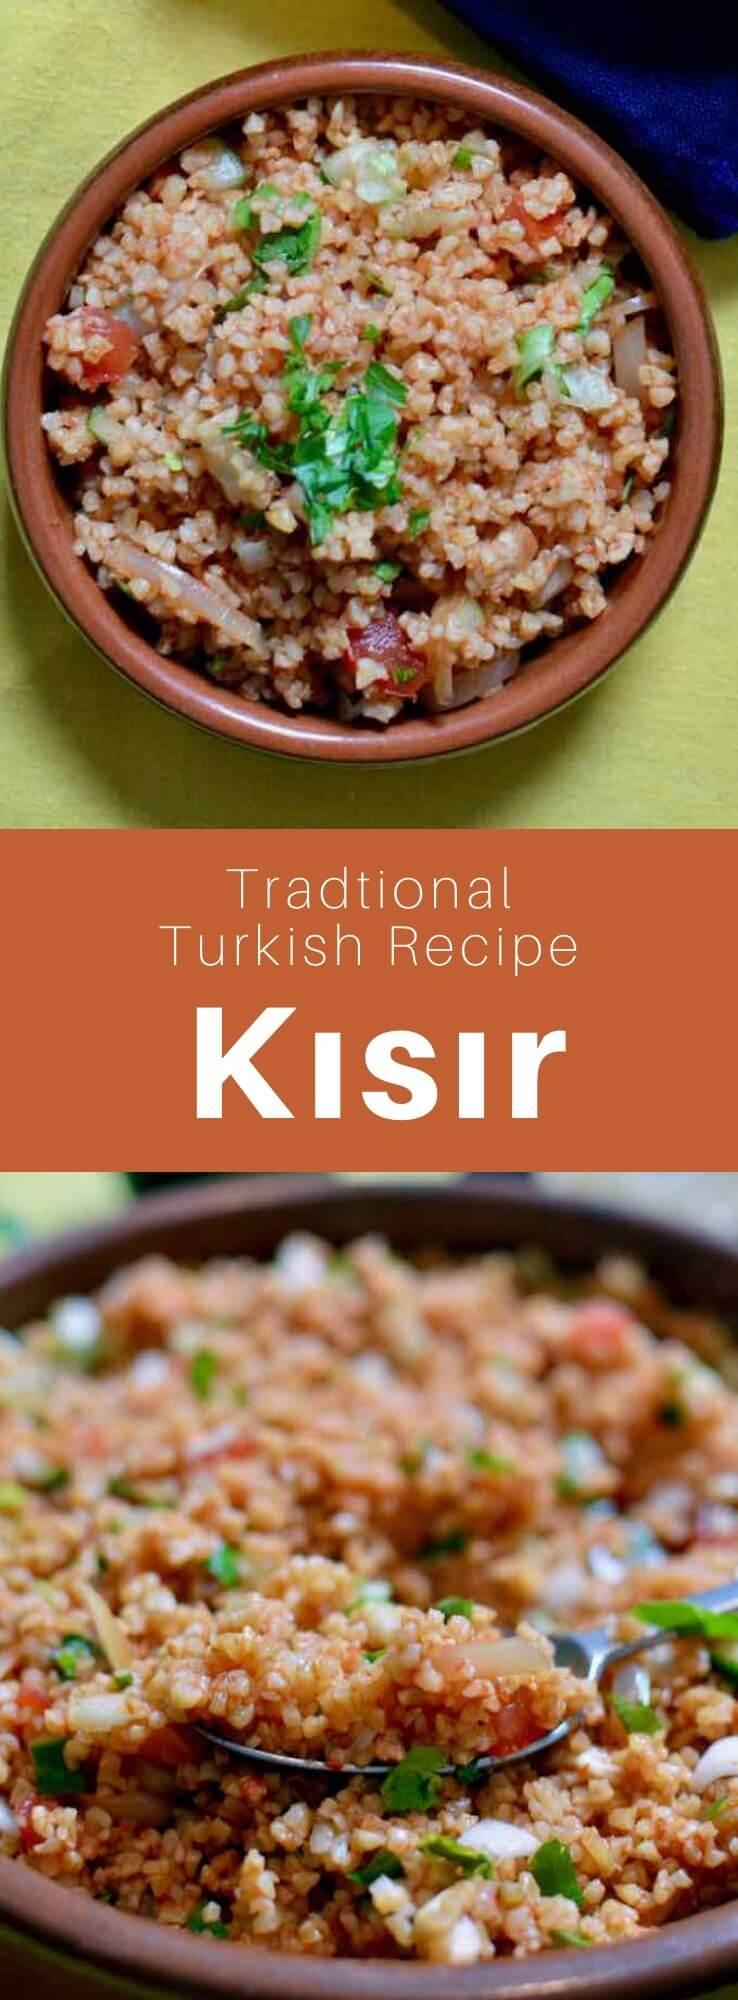 Kısır is a mezze found in Turkish and Kurdish cuisines, that is similar to tabbouleh. The main ingredients are fine bulgur, parsley and tomato purée. #Turkey #Turkish #TurkishRecipe #TurkishFood #TurkishCuisine #WorldCuisine #196flavors